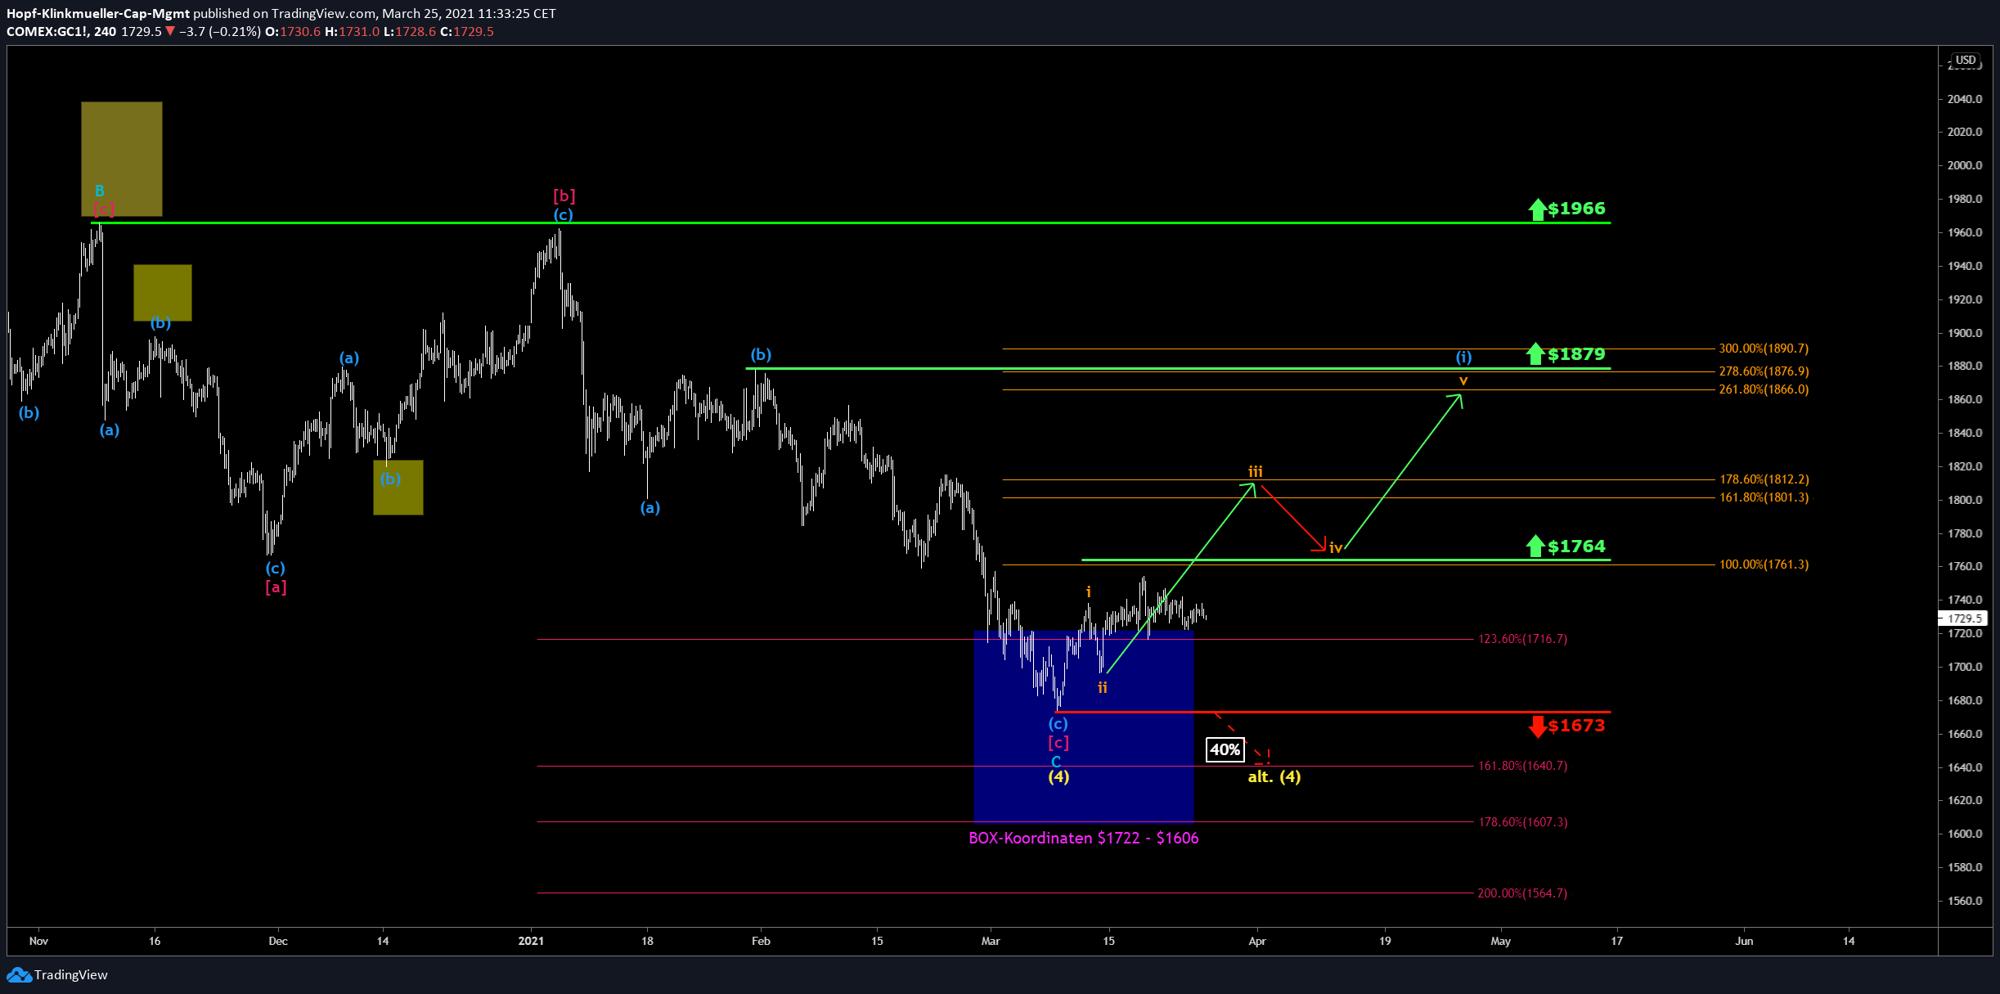 Chart des Goldpreis mit Szenarien